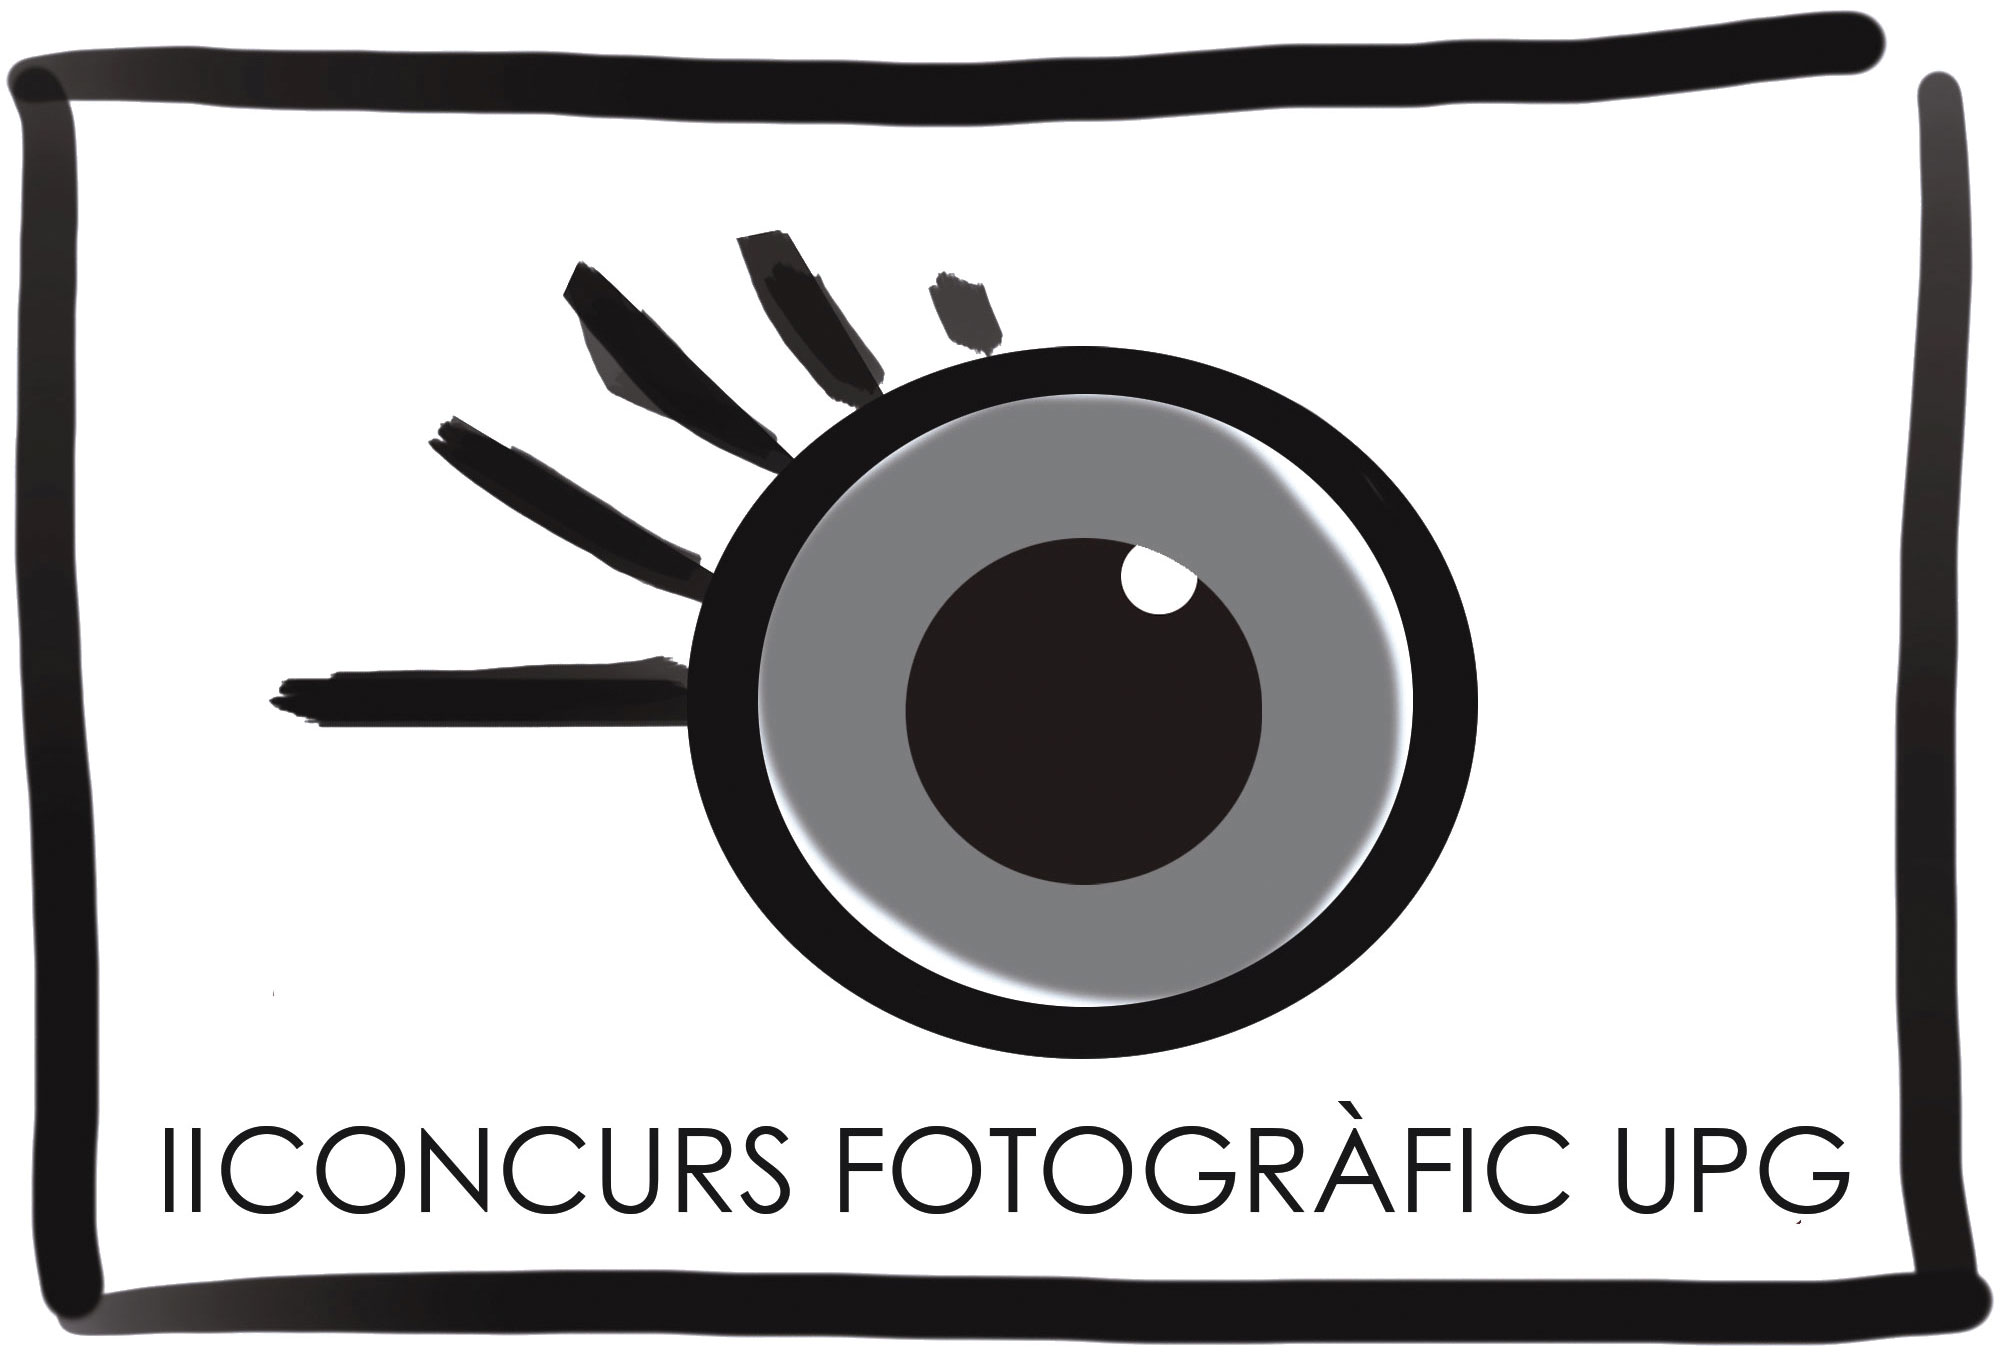 EXPOSICIO DE FOTOGRAFIES CERTAMEN UPG